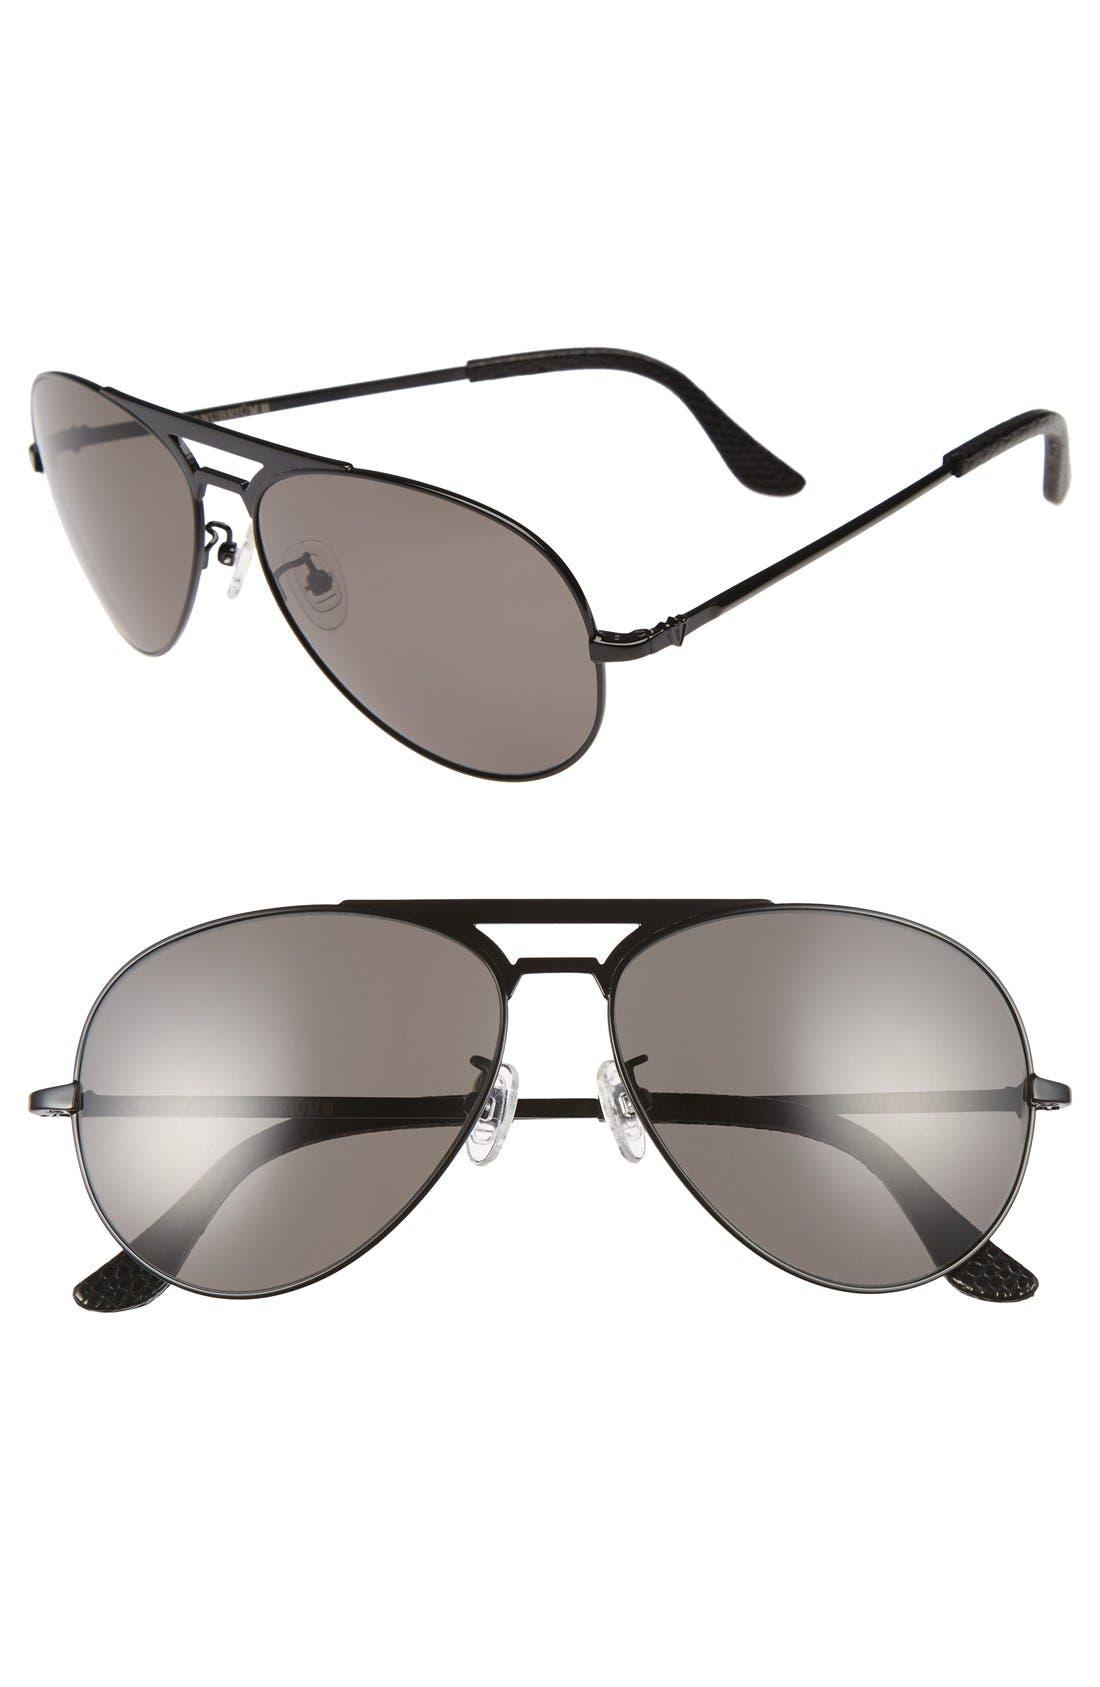 VALLEY 51mm Manubrium Aviator Sunglasses